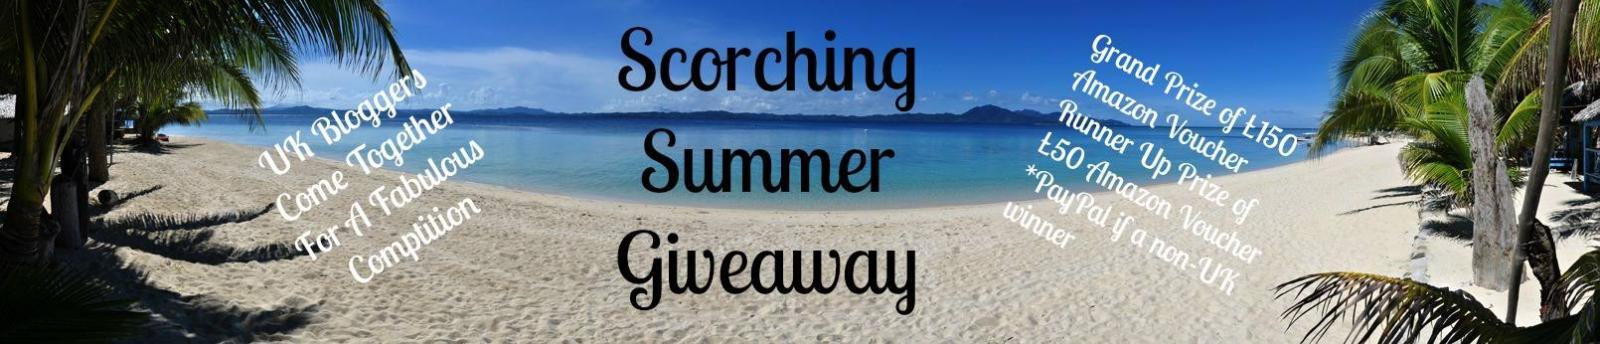 Win an £150 Amazon Voucher – Scorching Summer Giveaway